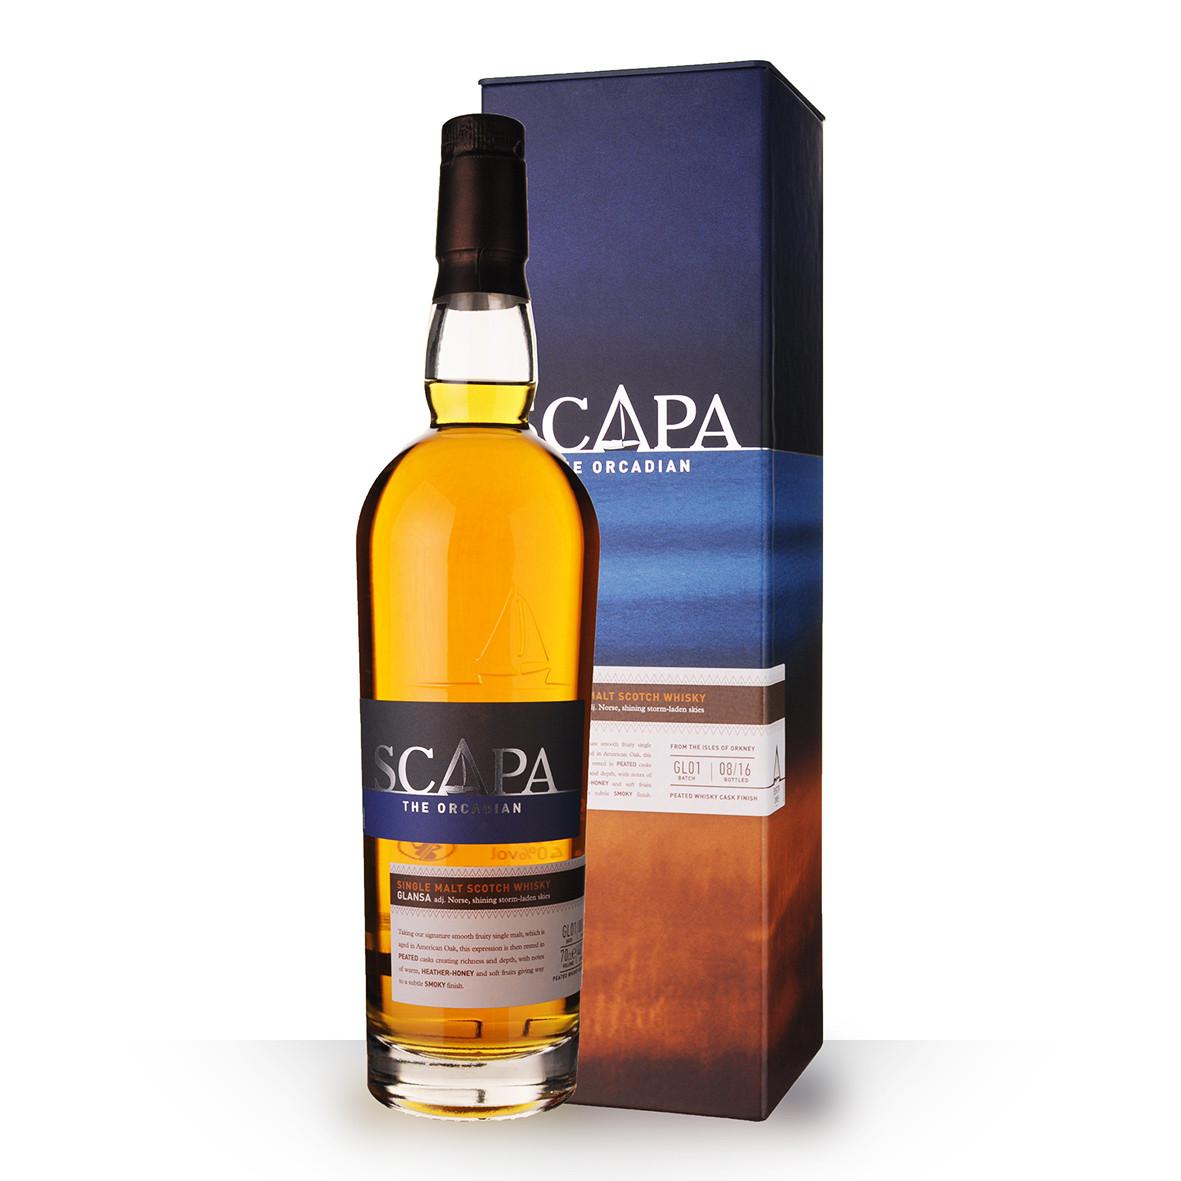 Whisky Scapa Glansa 70cl Coffret www.odyssee-vins.com